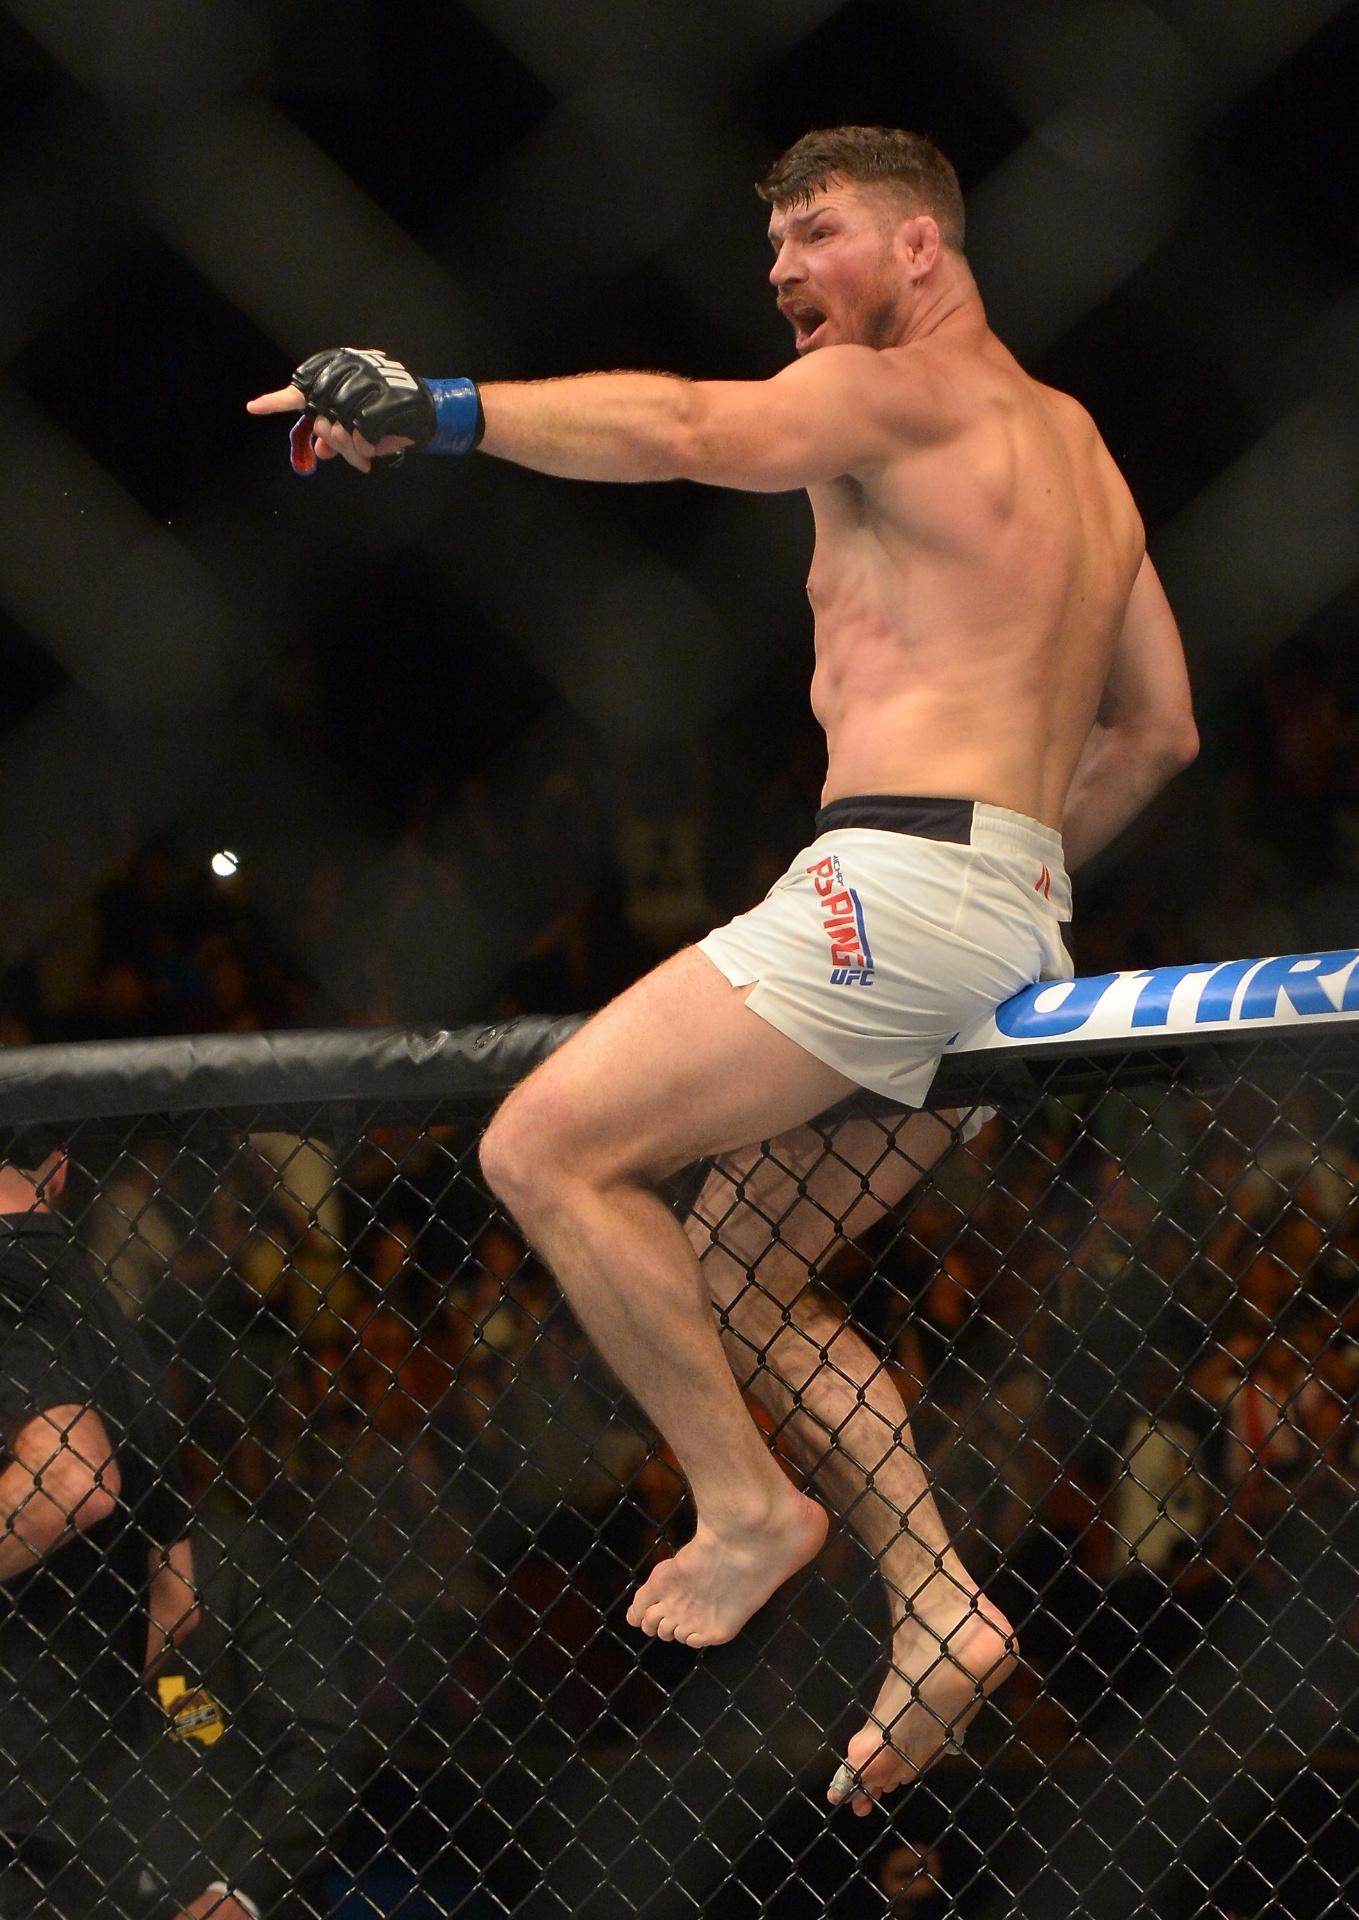 Michael Bisping celebra após nocaute sobre Luke Rockhold no UFC 199